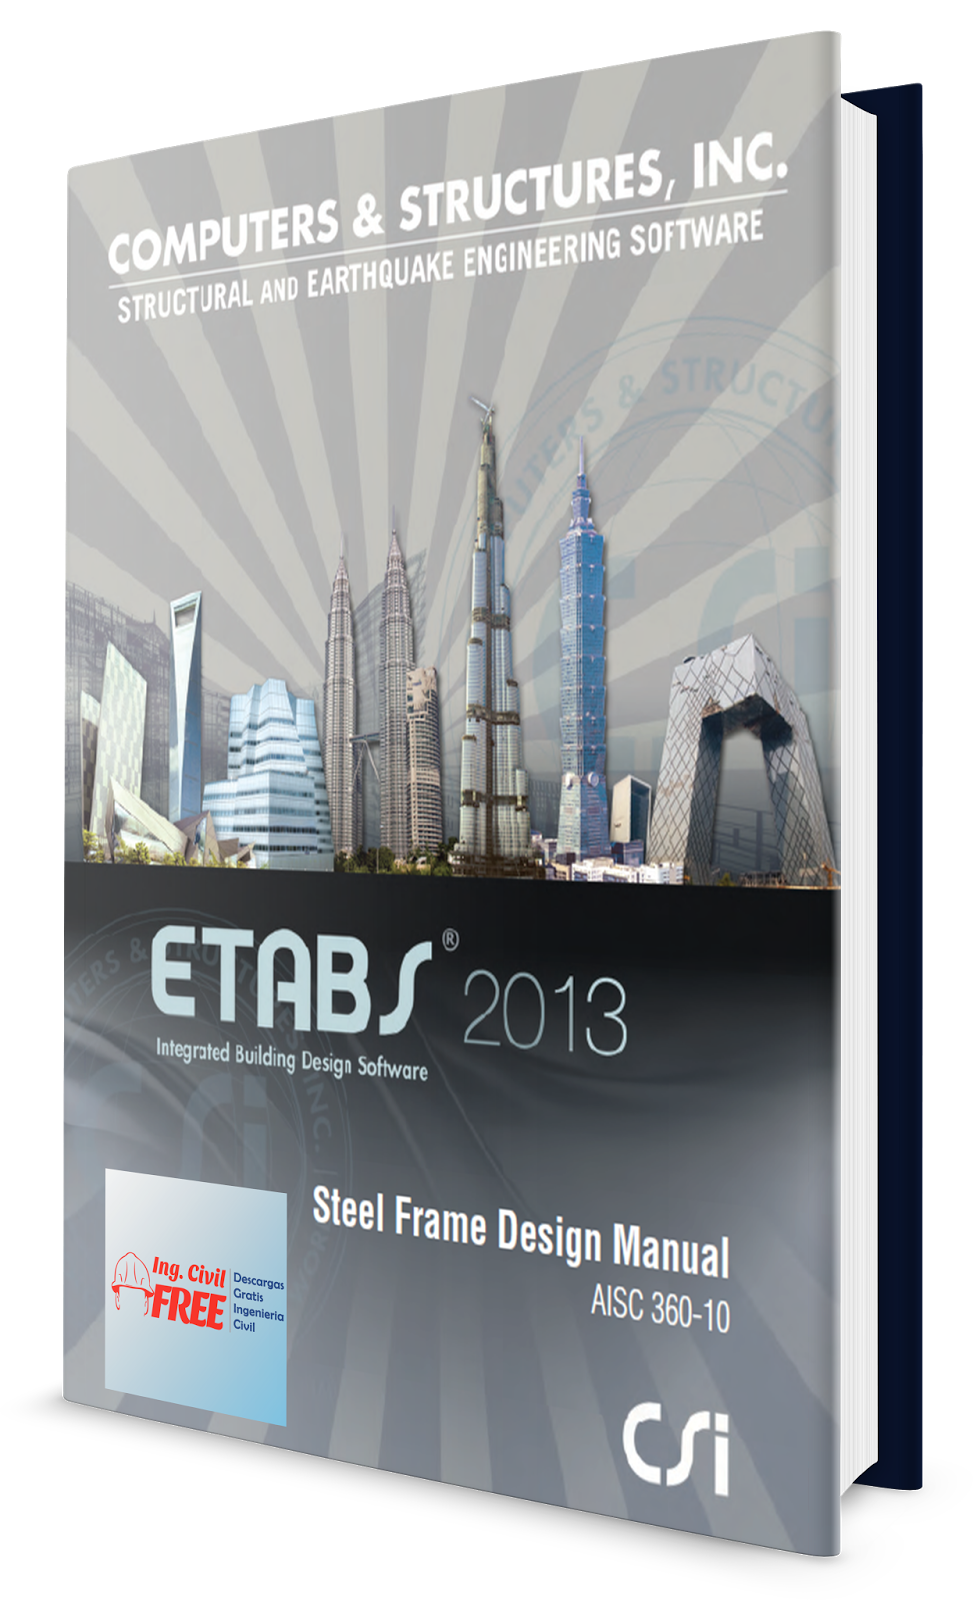 Steel Frame Design Manual Sap2000